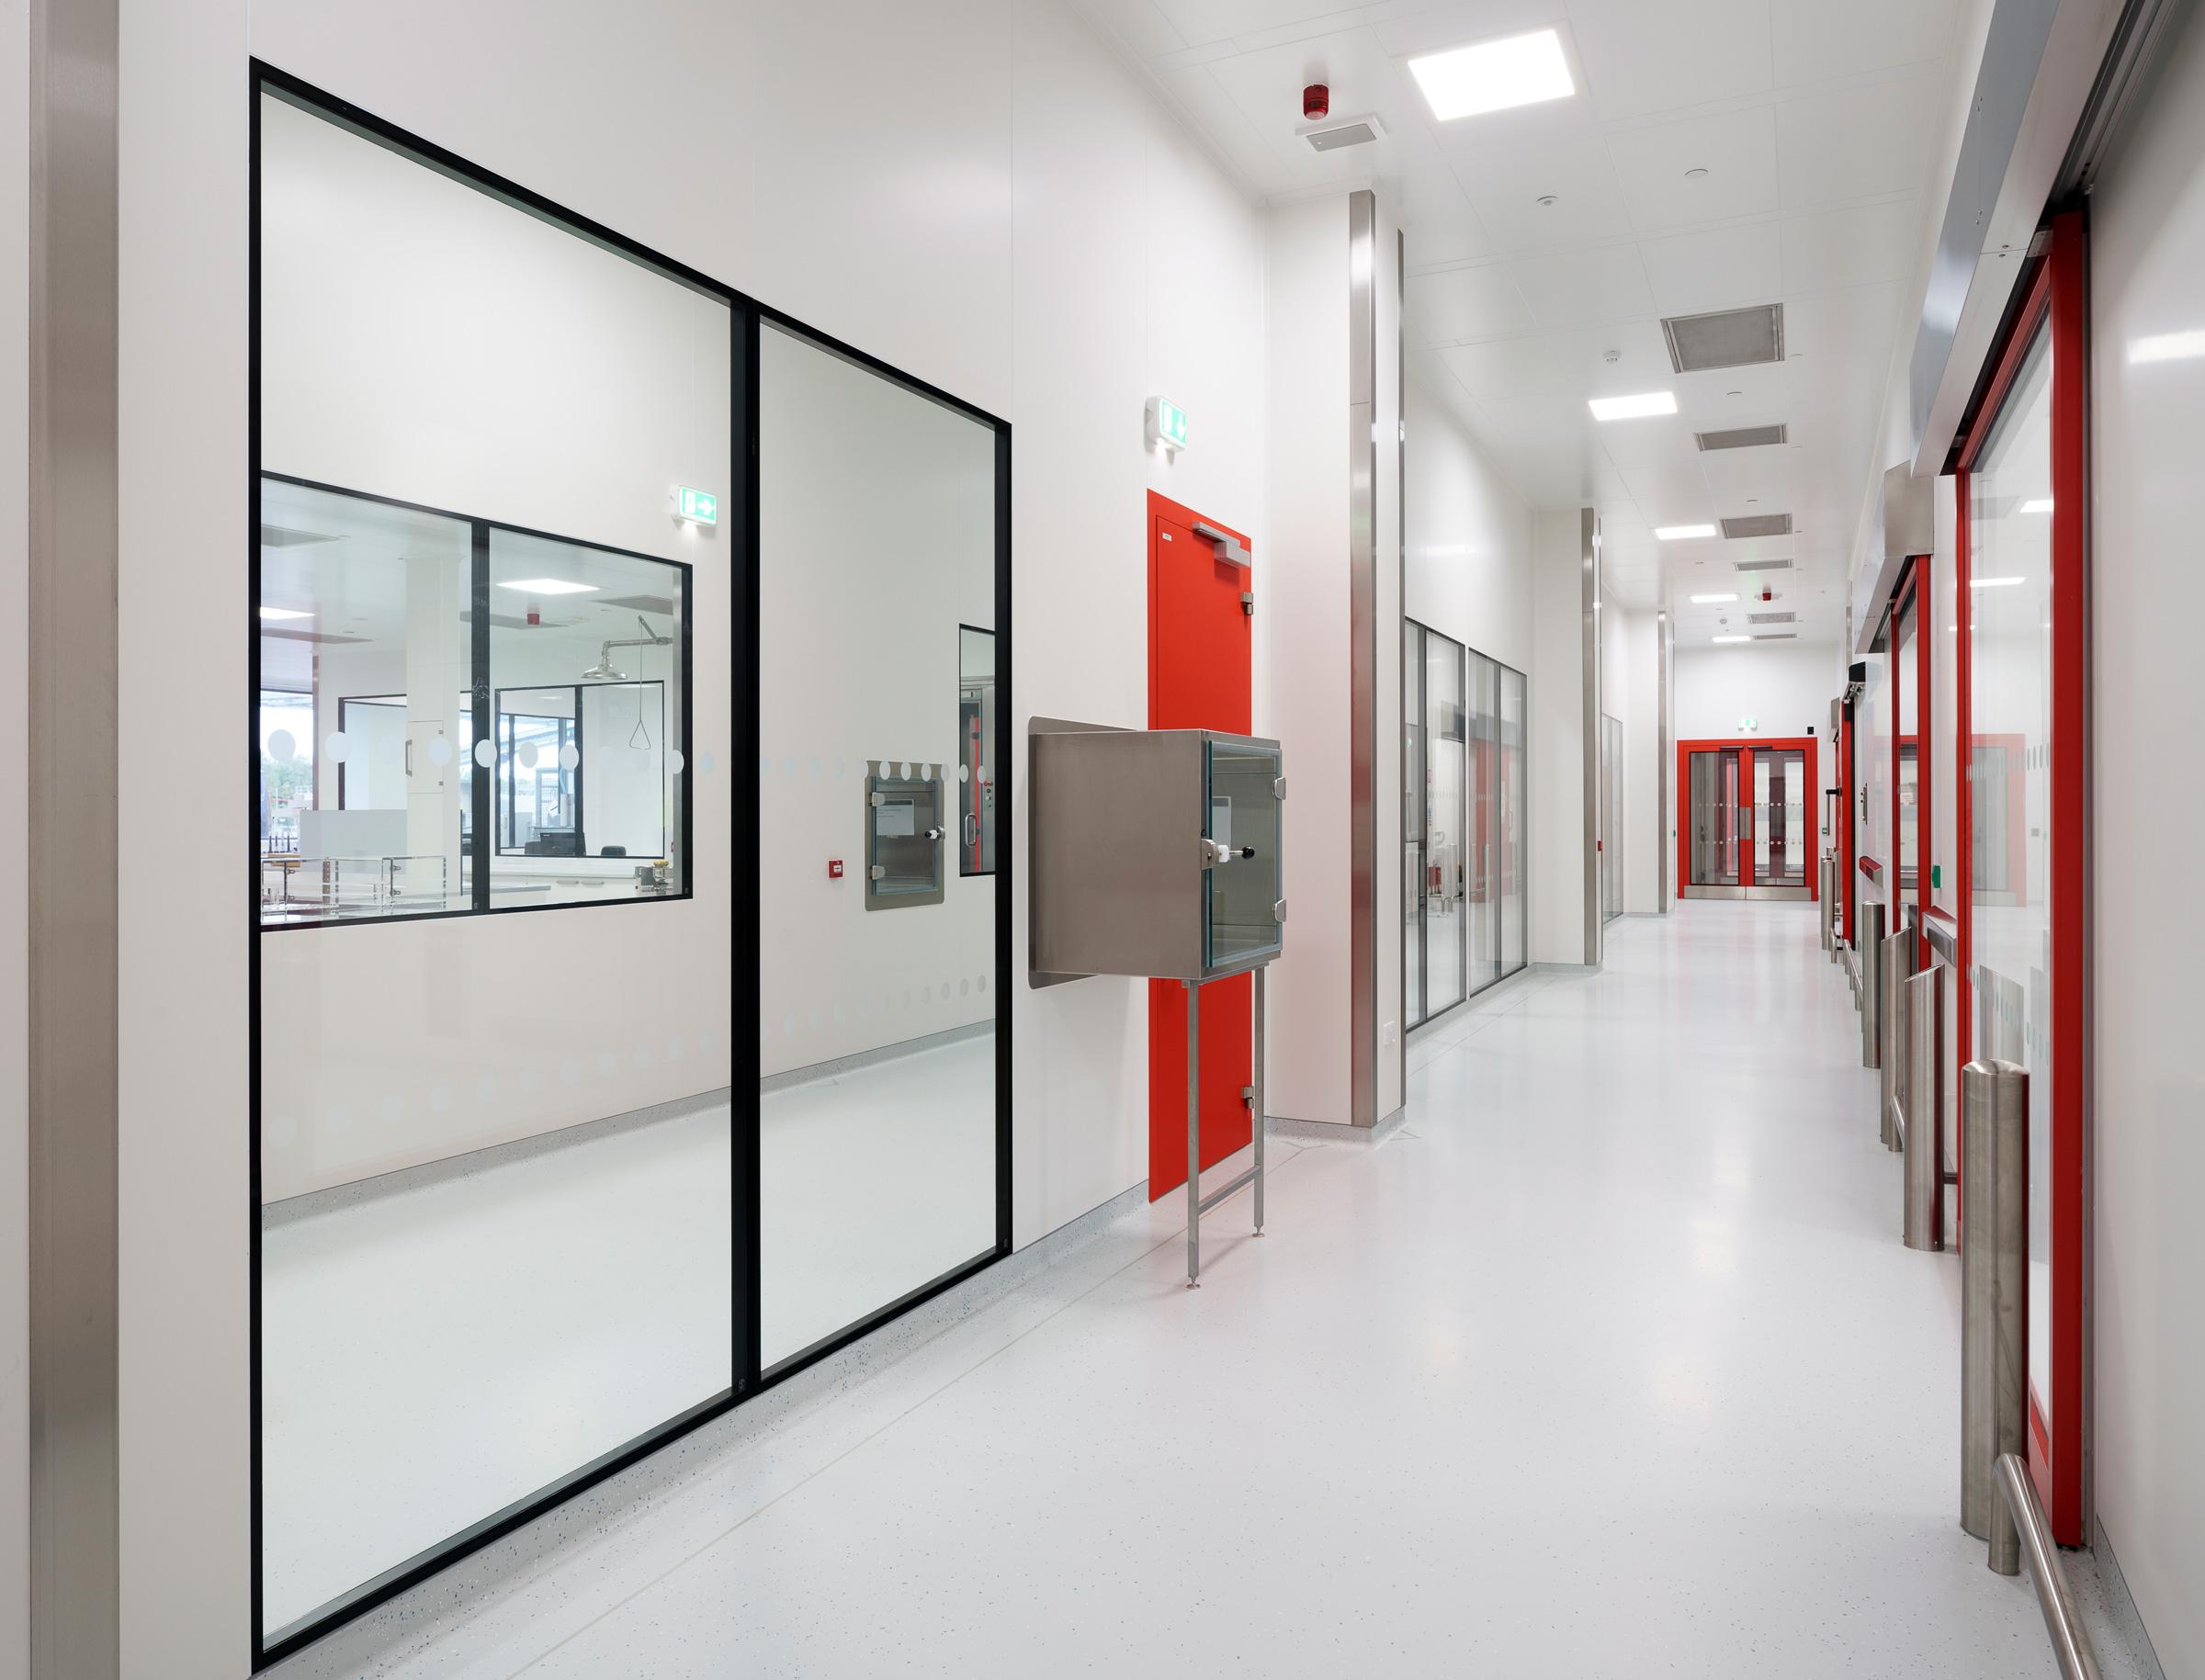 Takeda Pharmalab